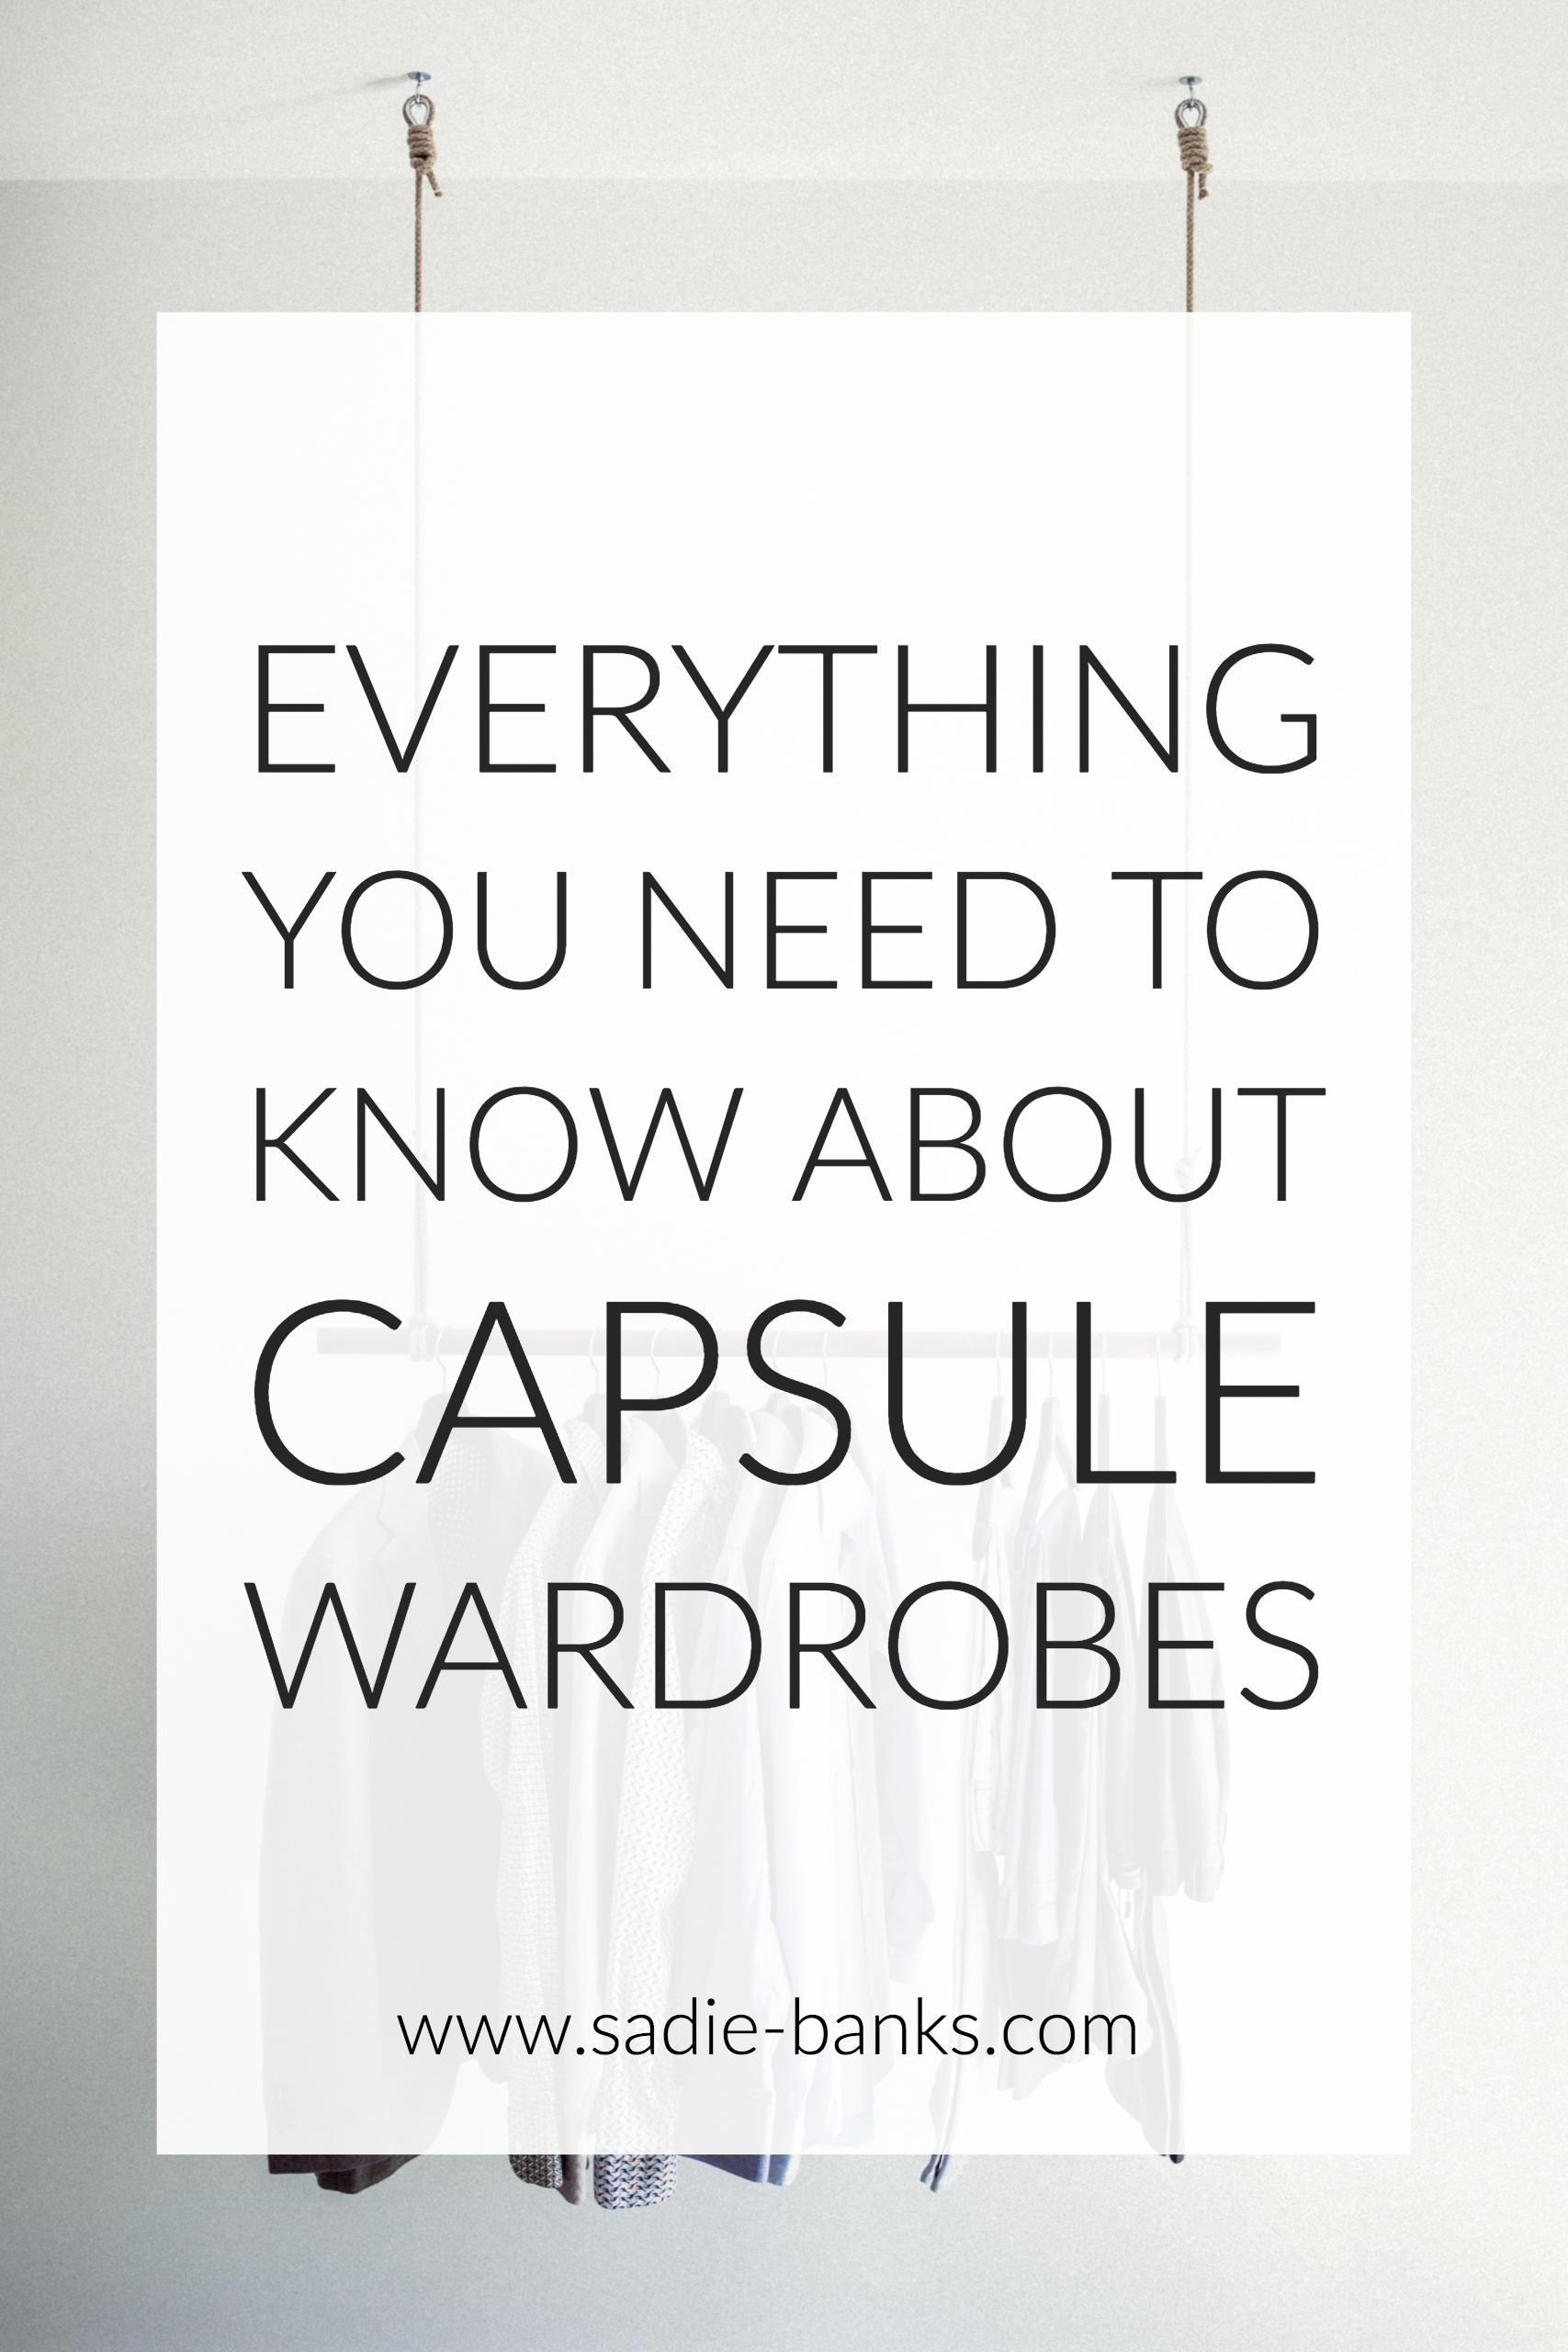 Capsule Wardrobe | Capsule Wardrobes how to build a | Capsule Wardrobe work | Sadie Banks Photography